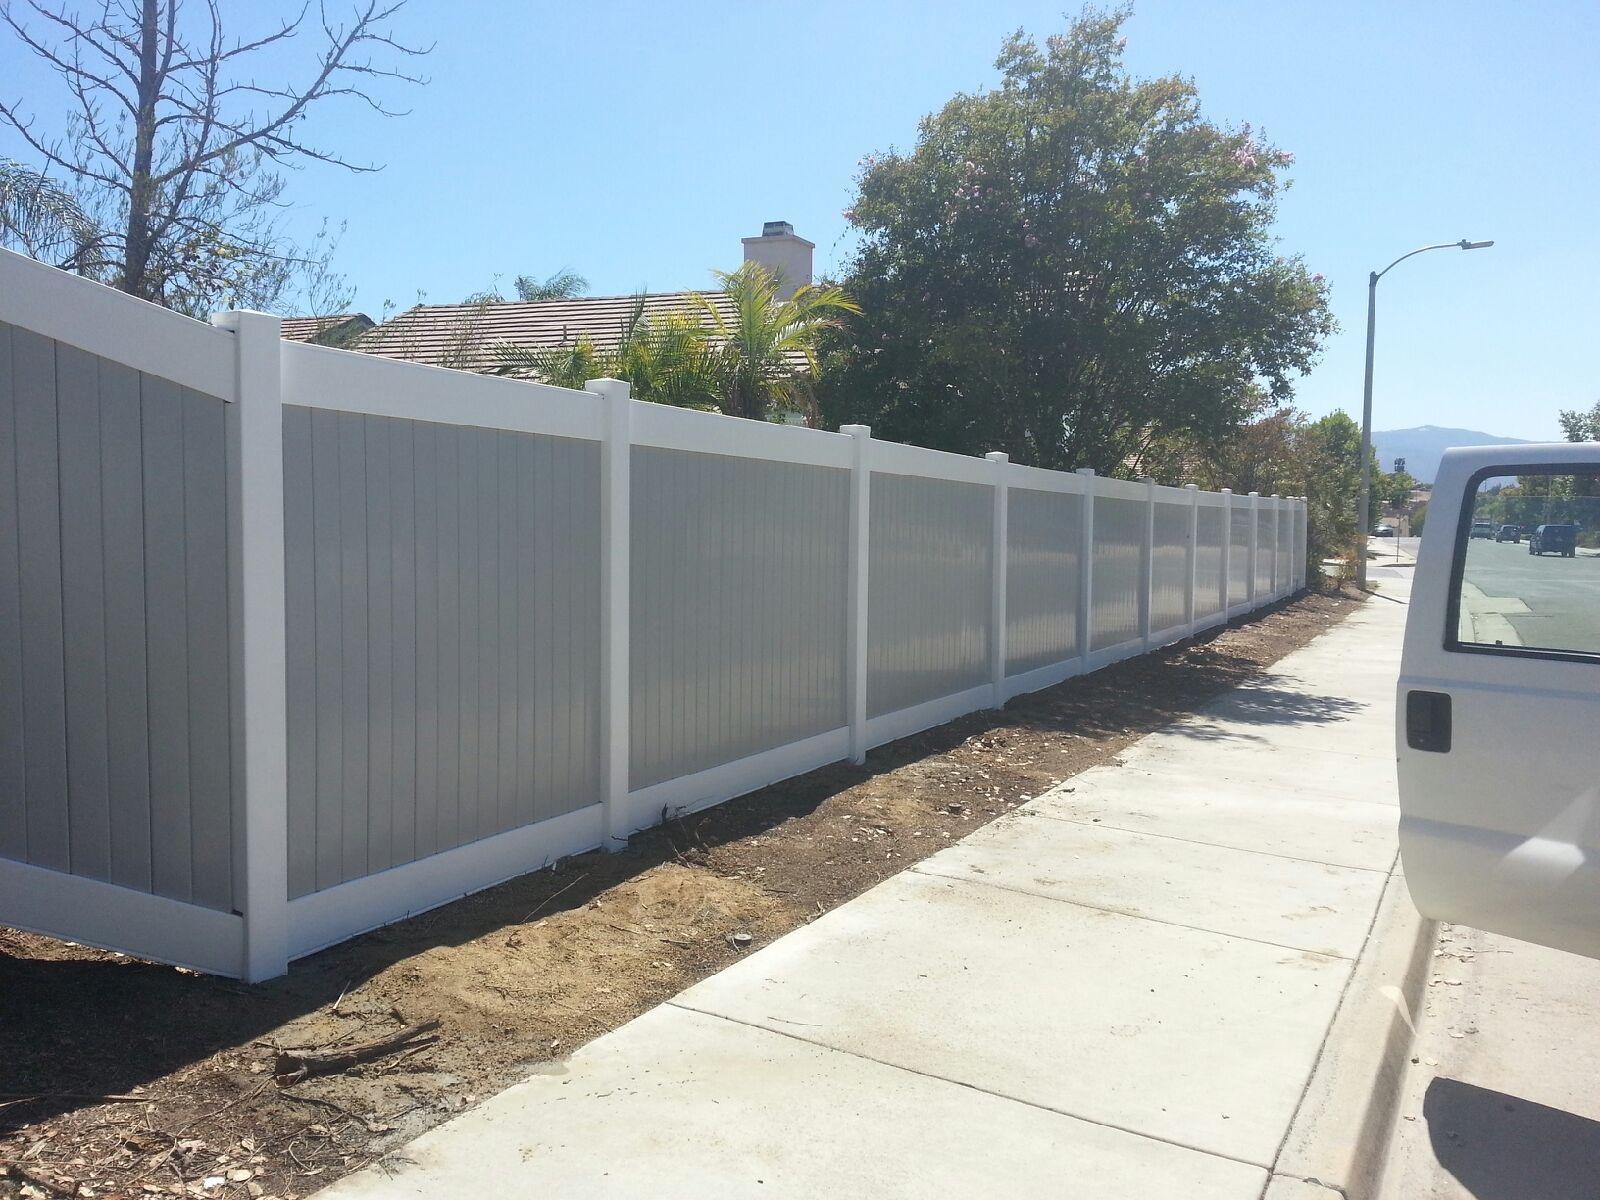 3T Fence image 25